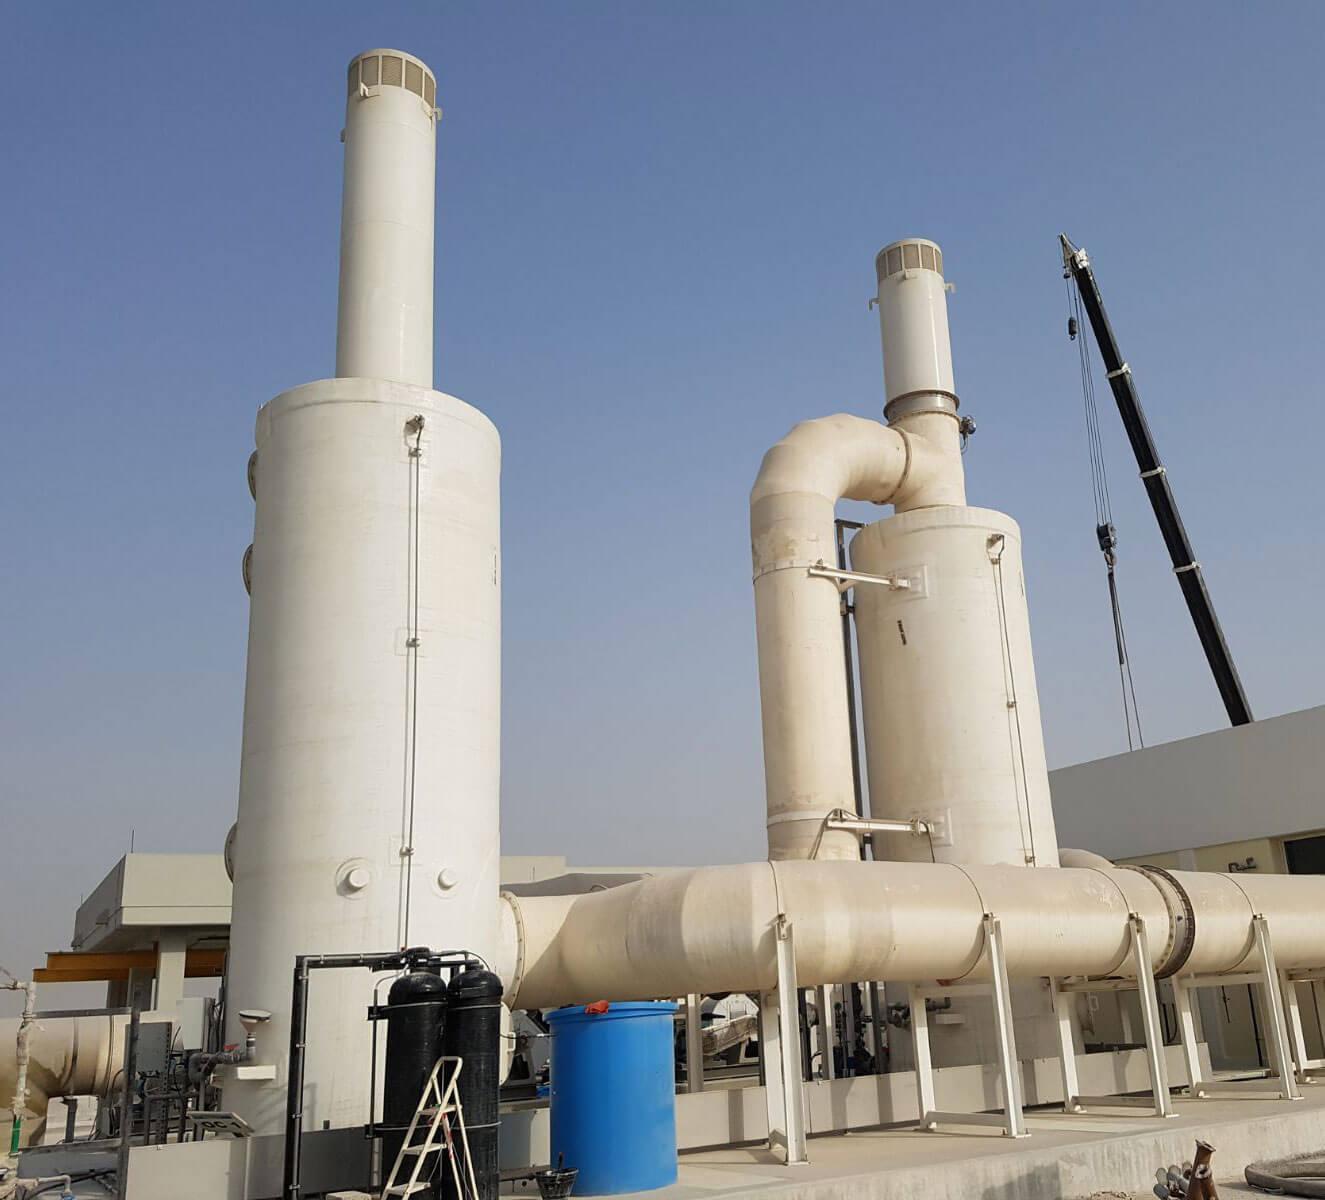 Doha industrial zone OCU plant